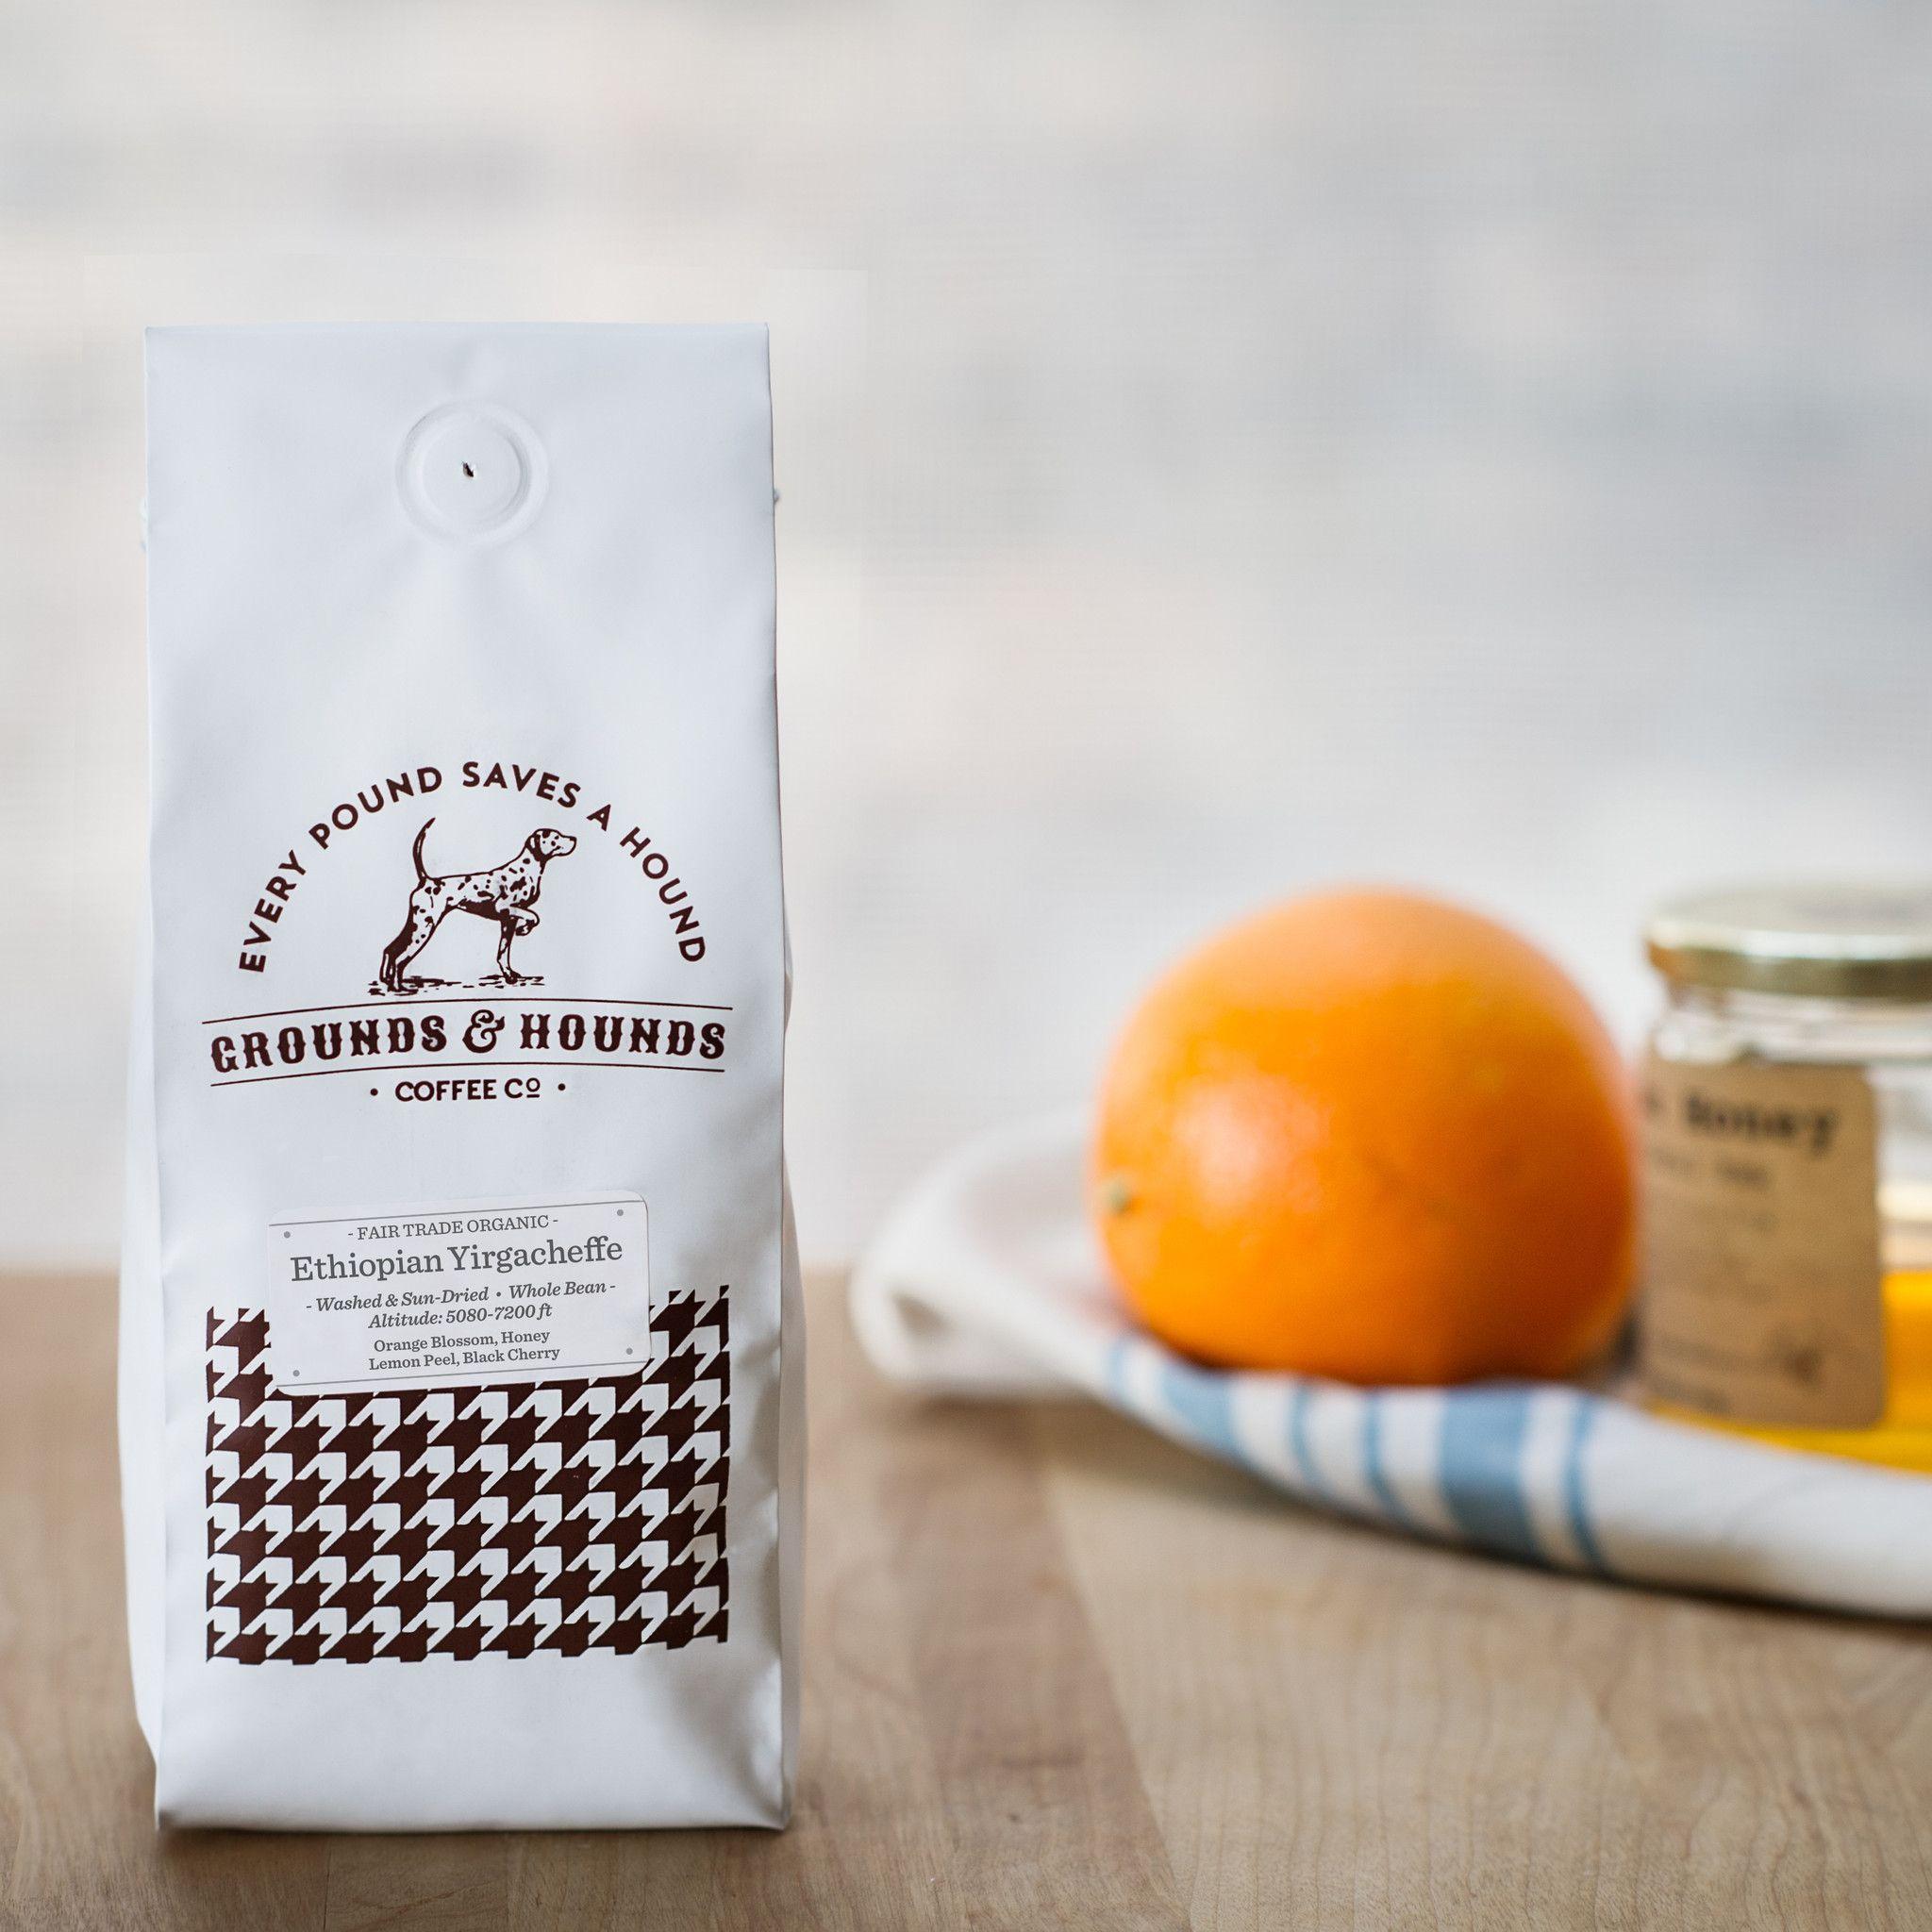 Single Origin Ethiopian Yirgacheffe Fair trade coffee